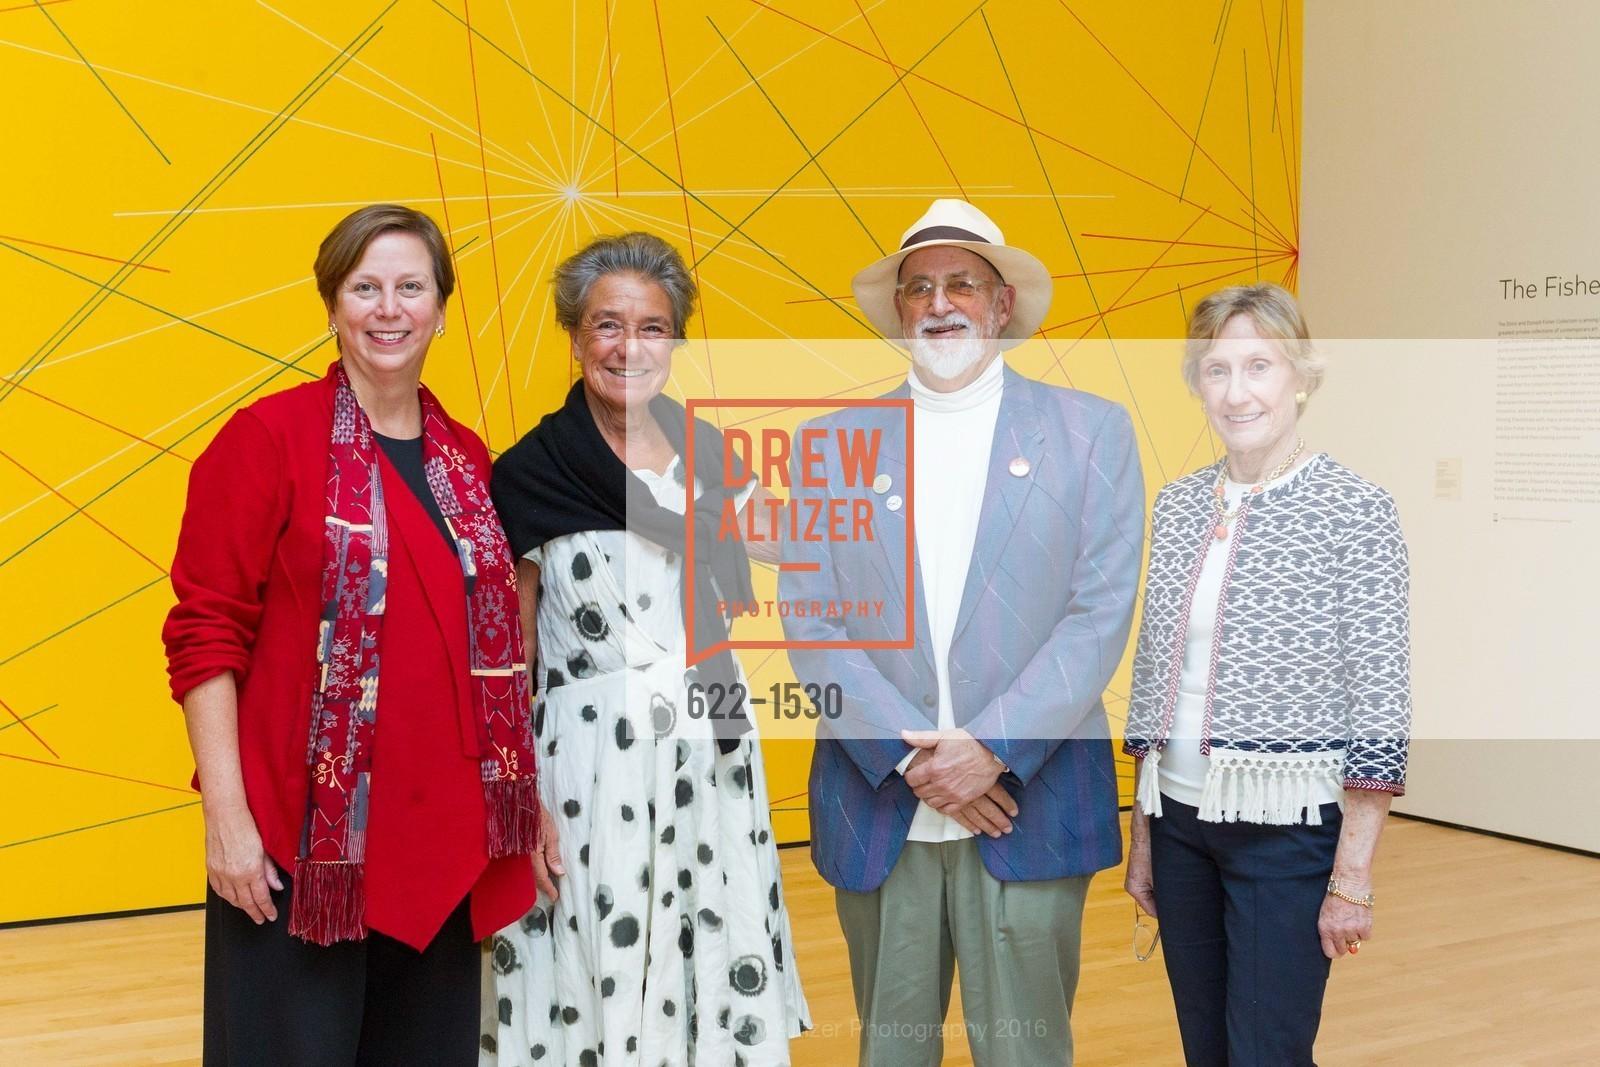 Laurie Fogarty, Patricia Unterman, Tim Savinar, Nancy Bechtle, Photo #622-1530